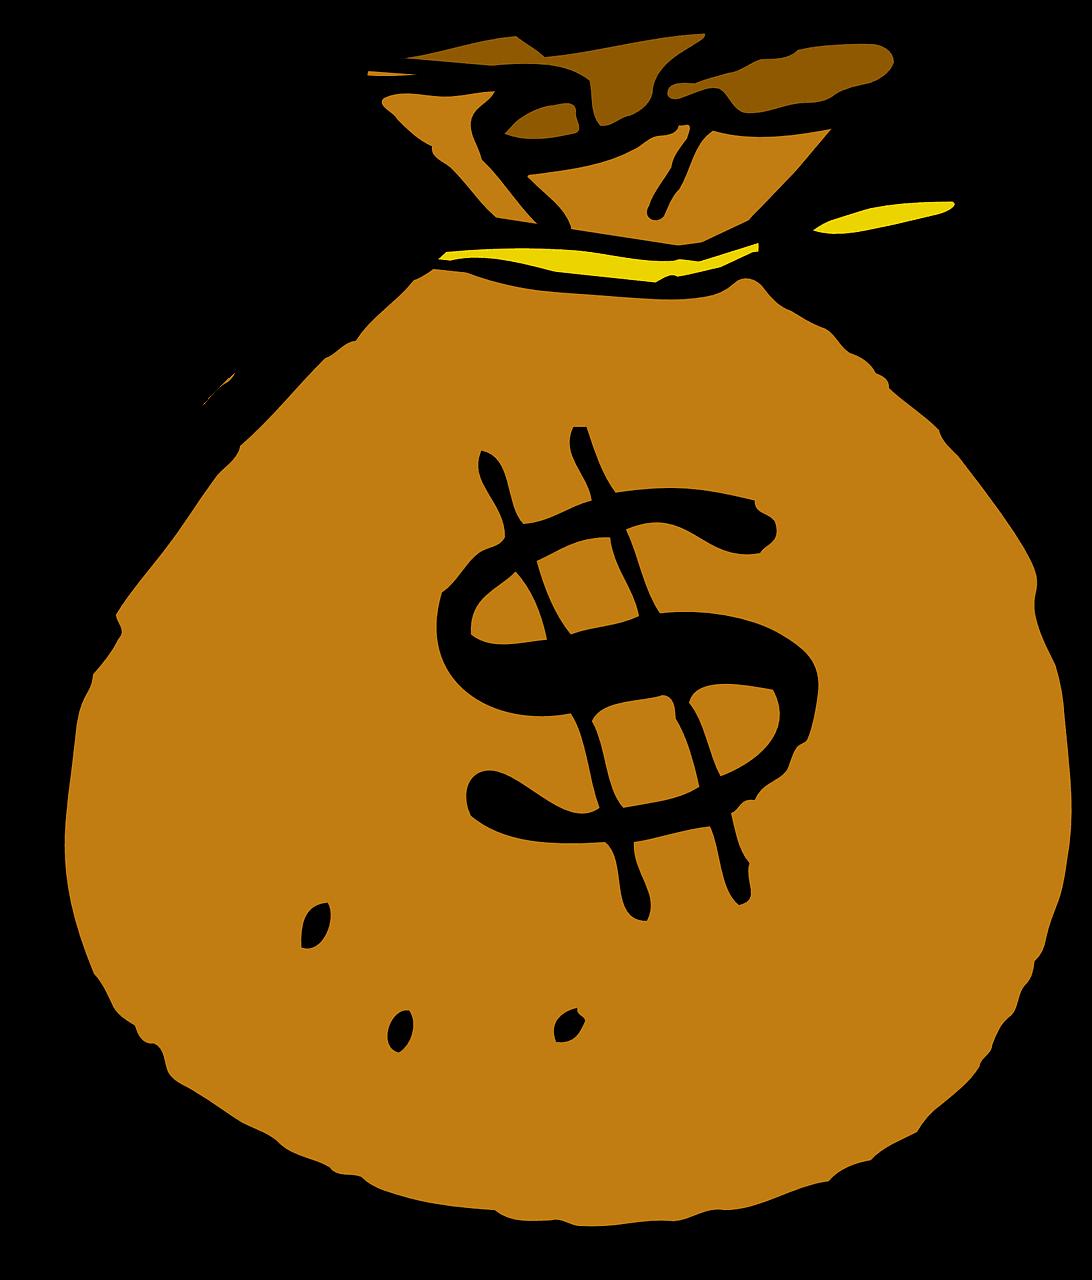 כסף אבוד